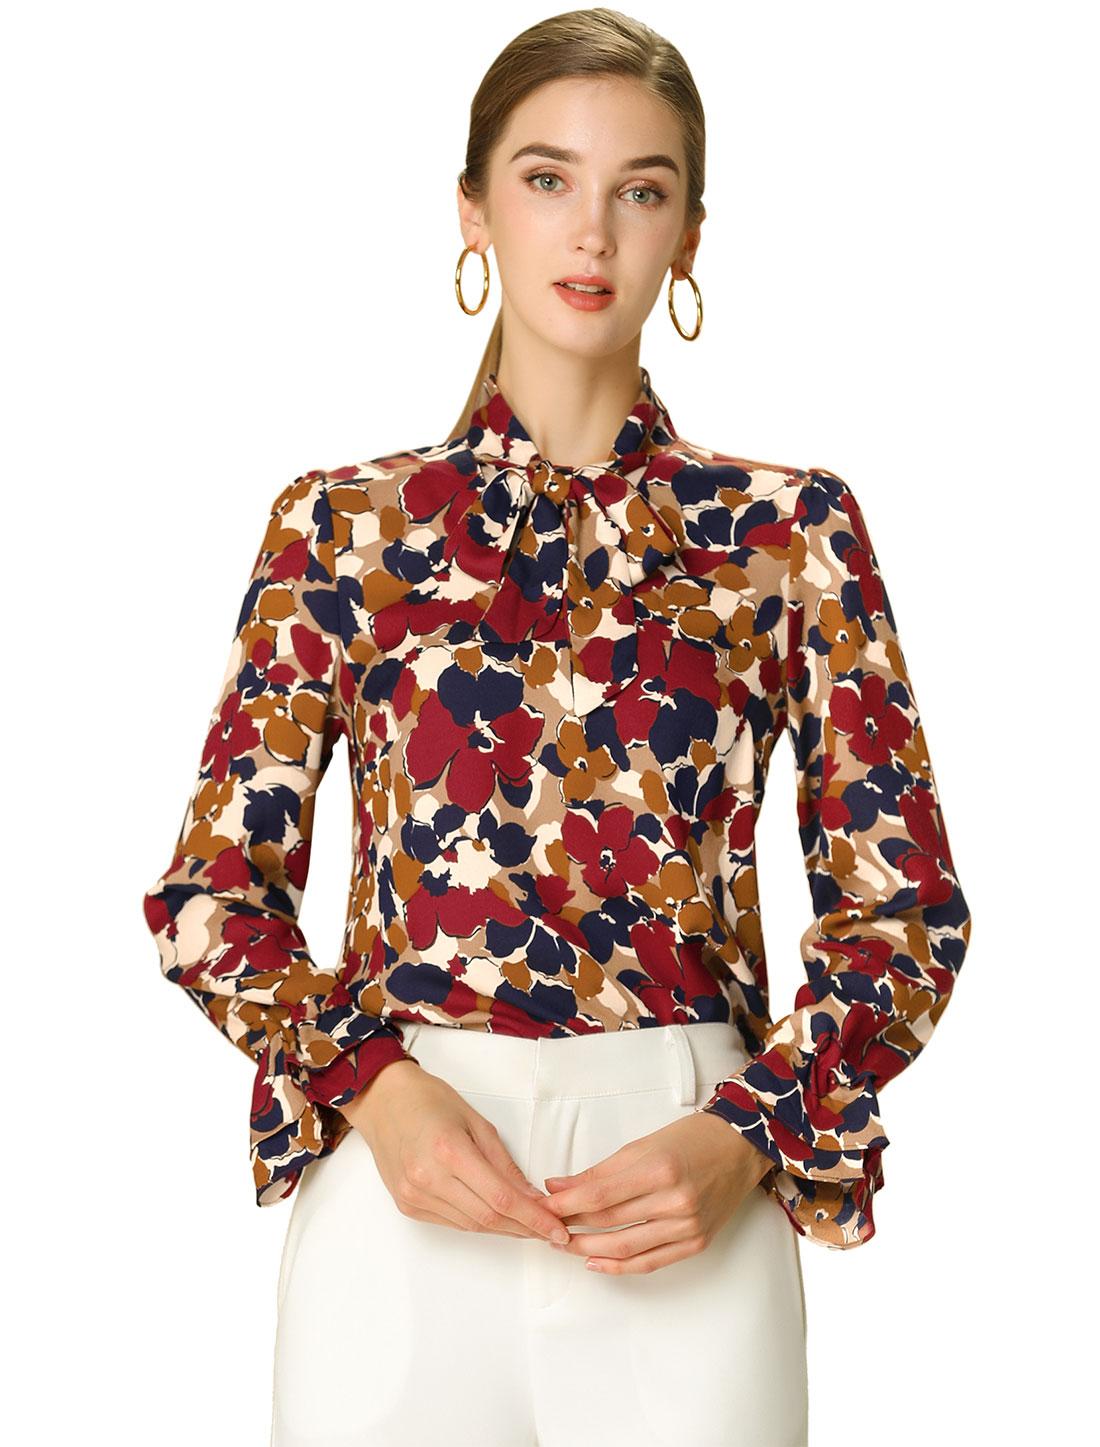 Allegra K Women's Tie Neck Long Sleeve Floral Shirt Red XL (US 18)